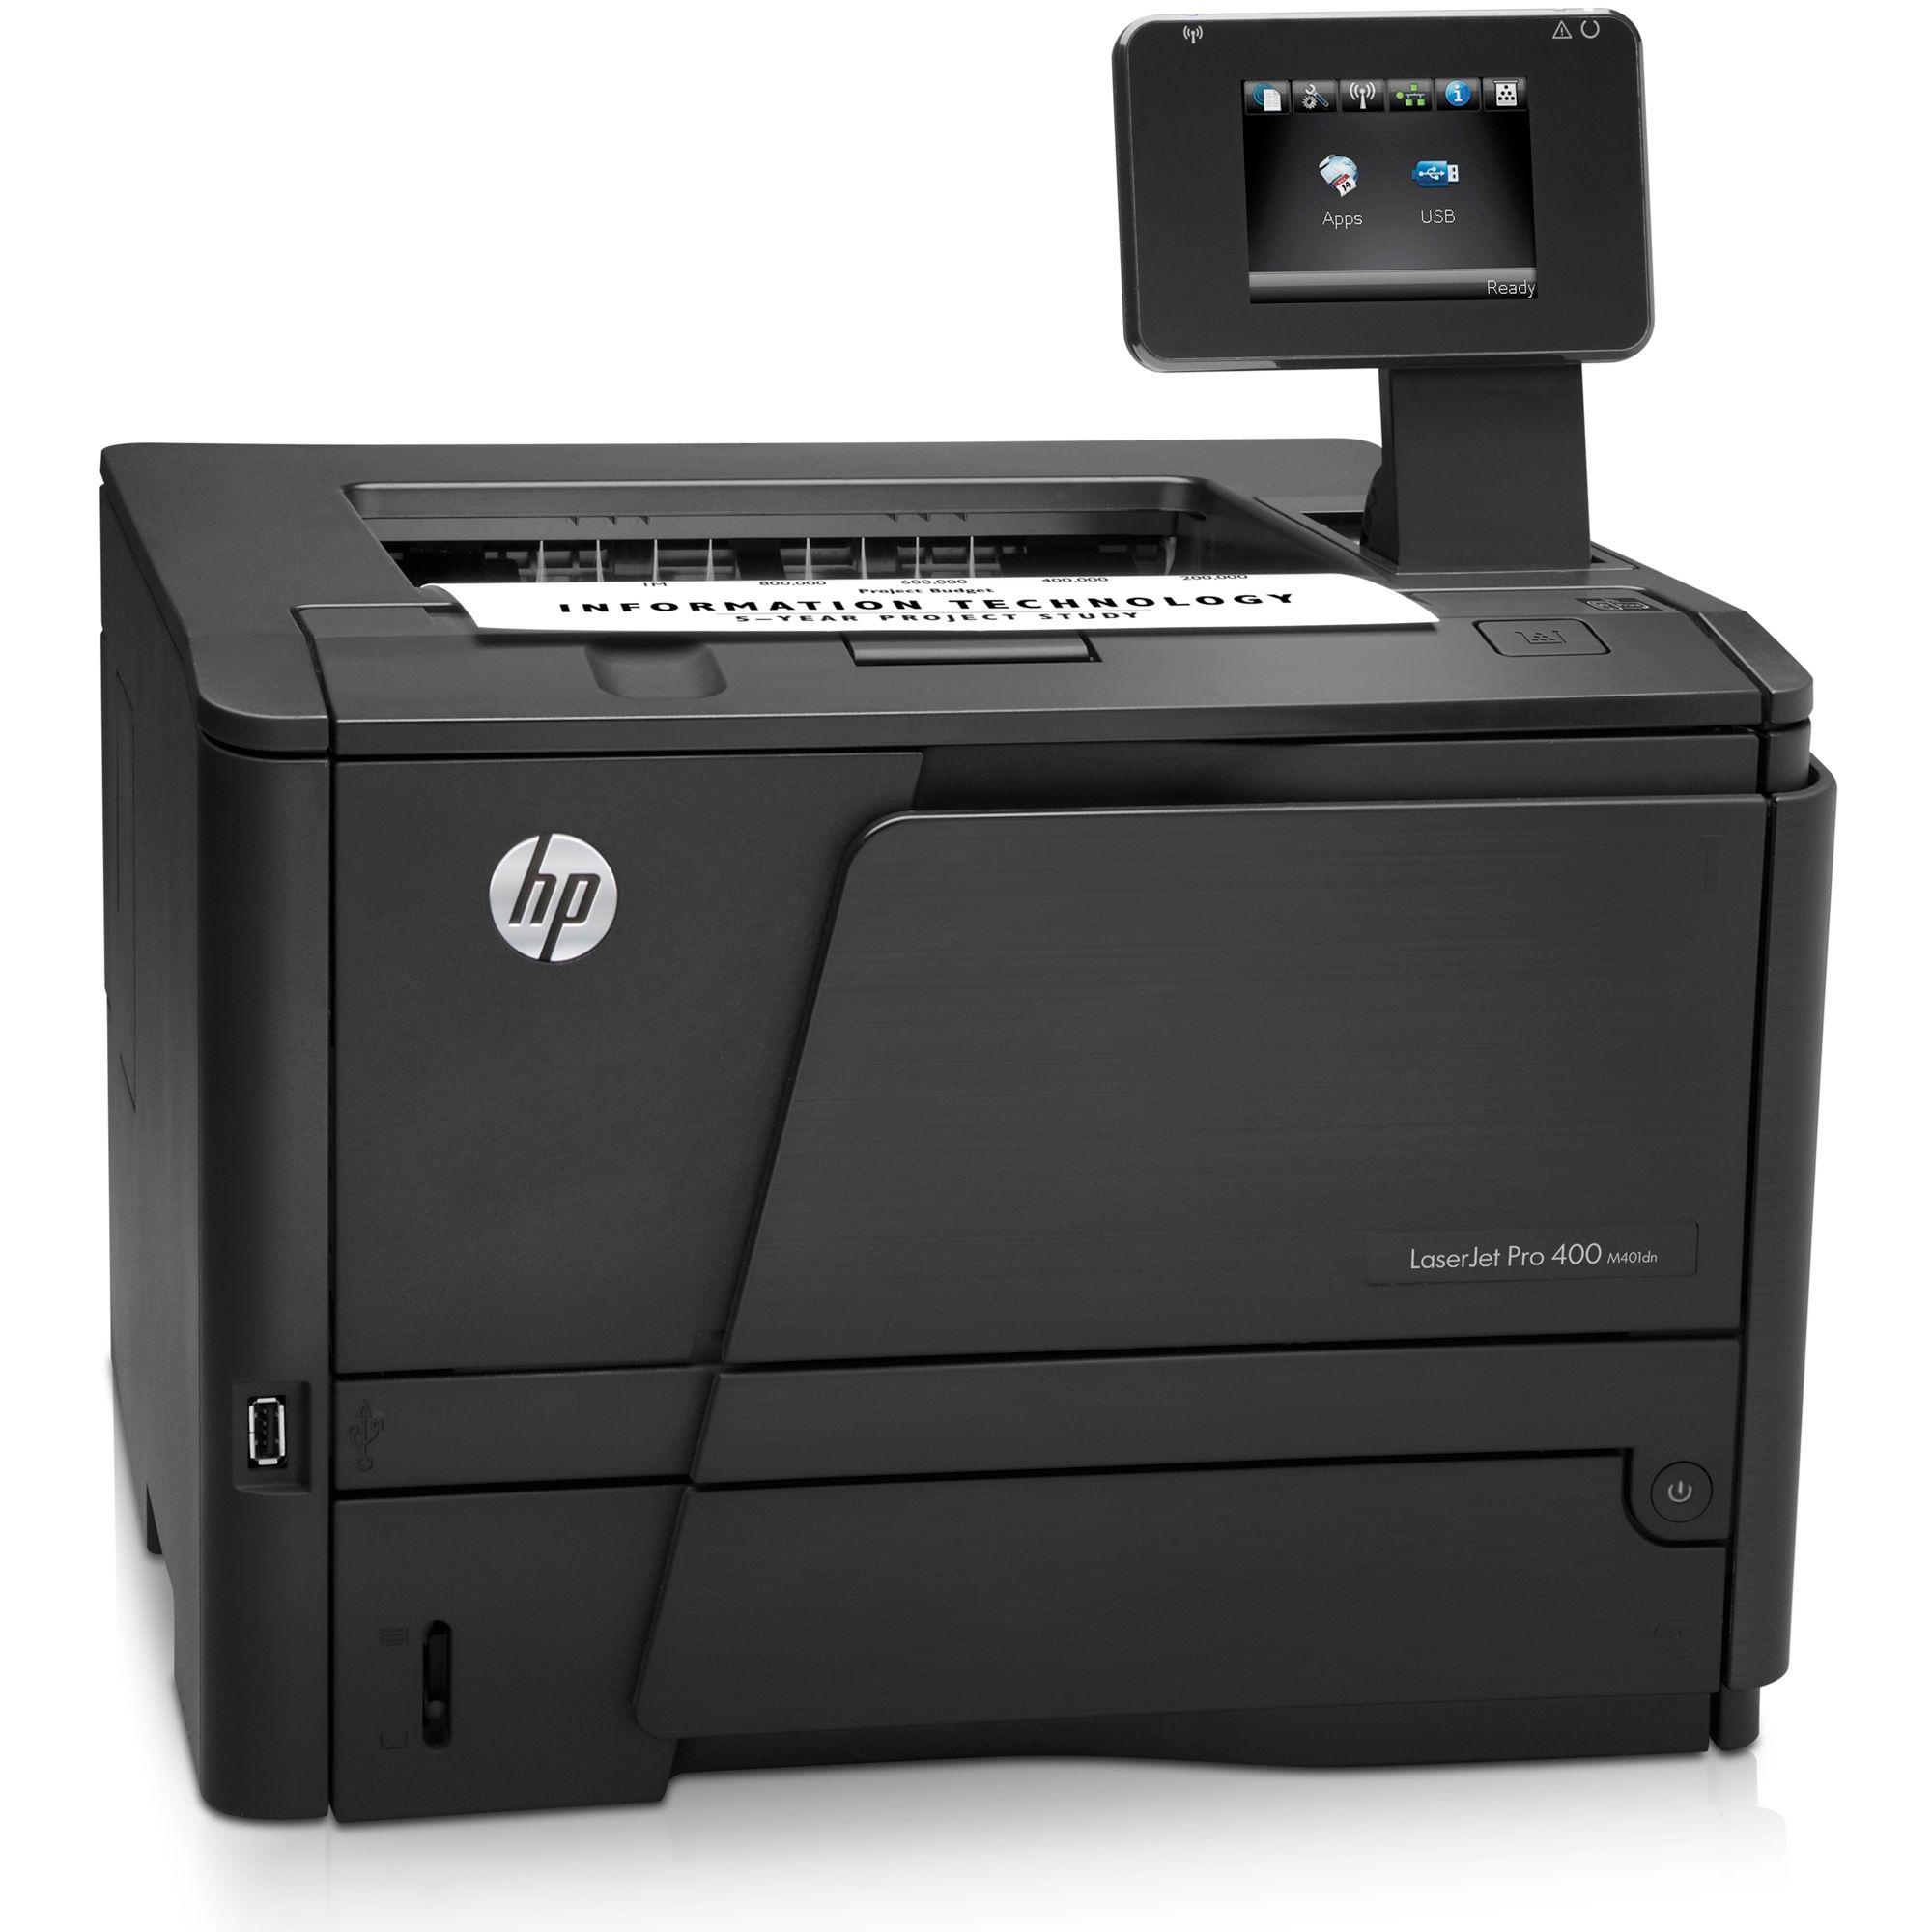 Imprimanta Laser Monocrom HP 400 M401DN, Touchscreen, USB, Duplex, Retea, 1200x1200 dpi, 35 ppm